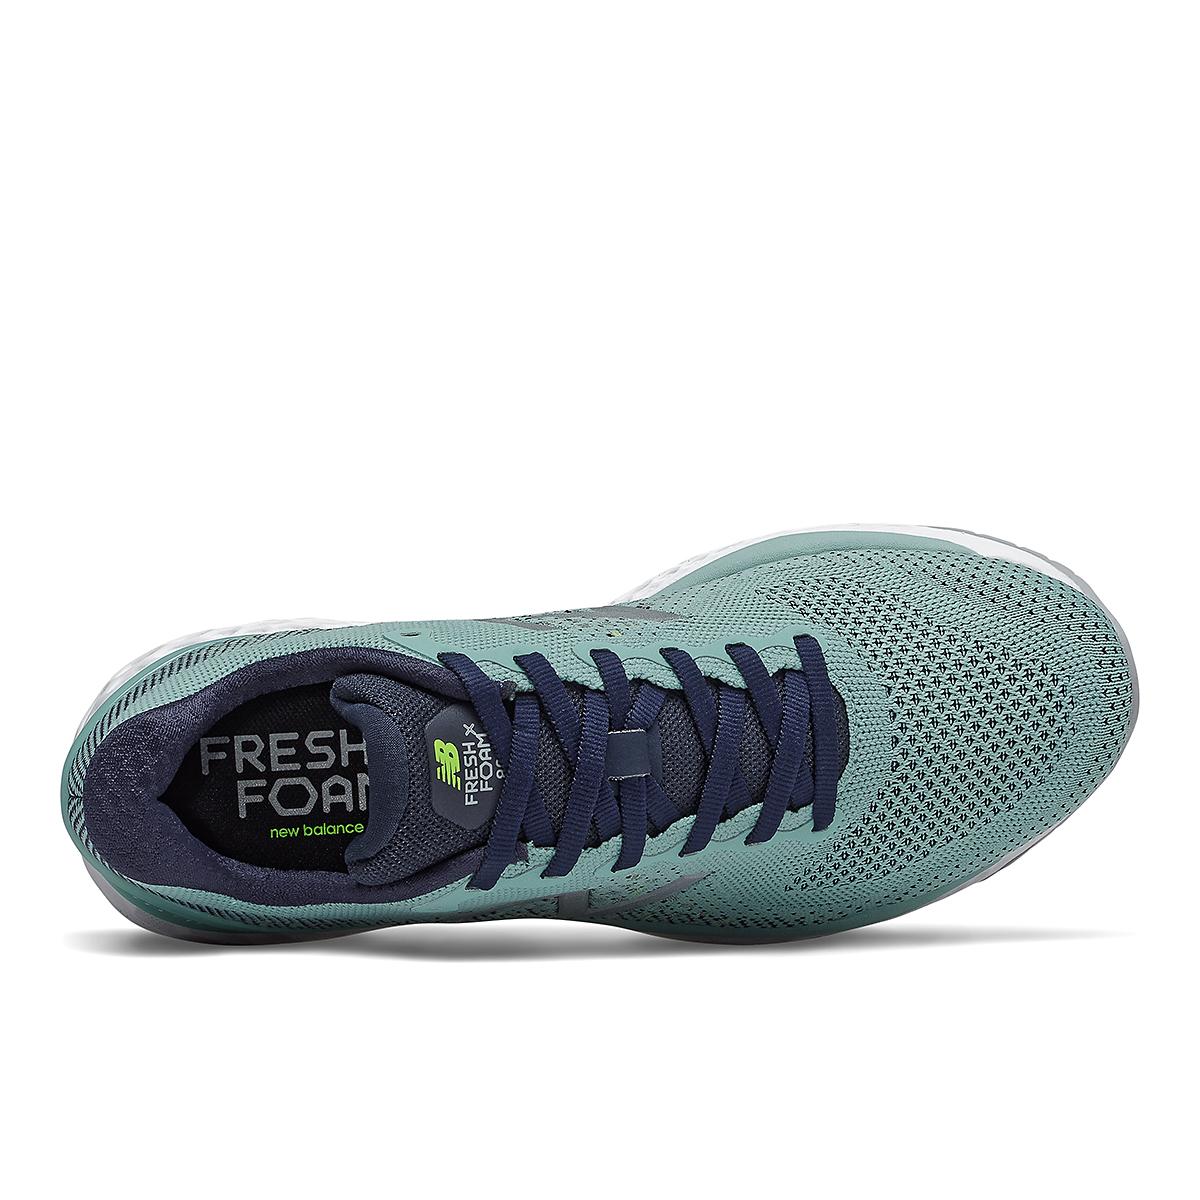 Women's New Balance 880V10 Running Shoe - Color: Storm Blue - Size: 5 - Width: Extra Wide, Storm Blue, large, image 3